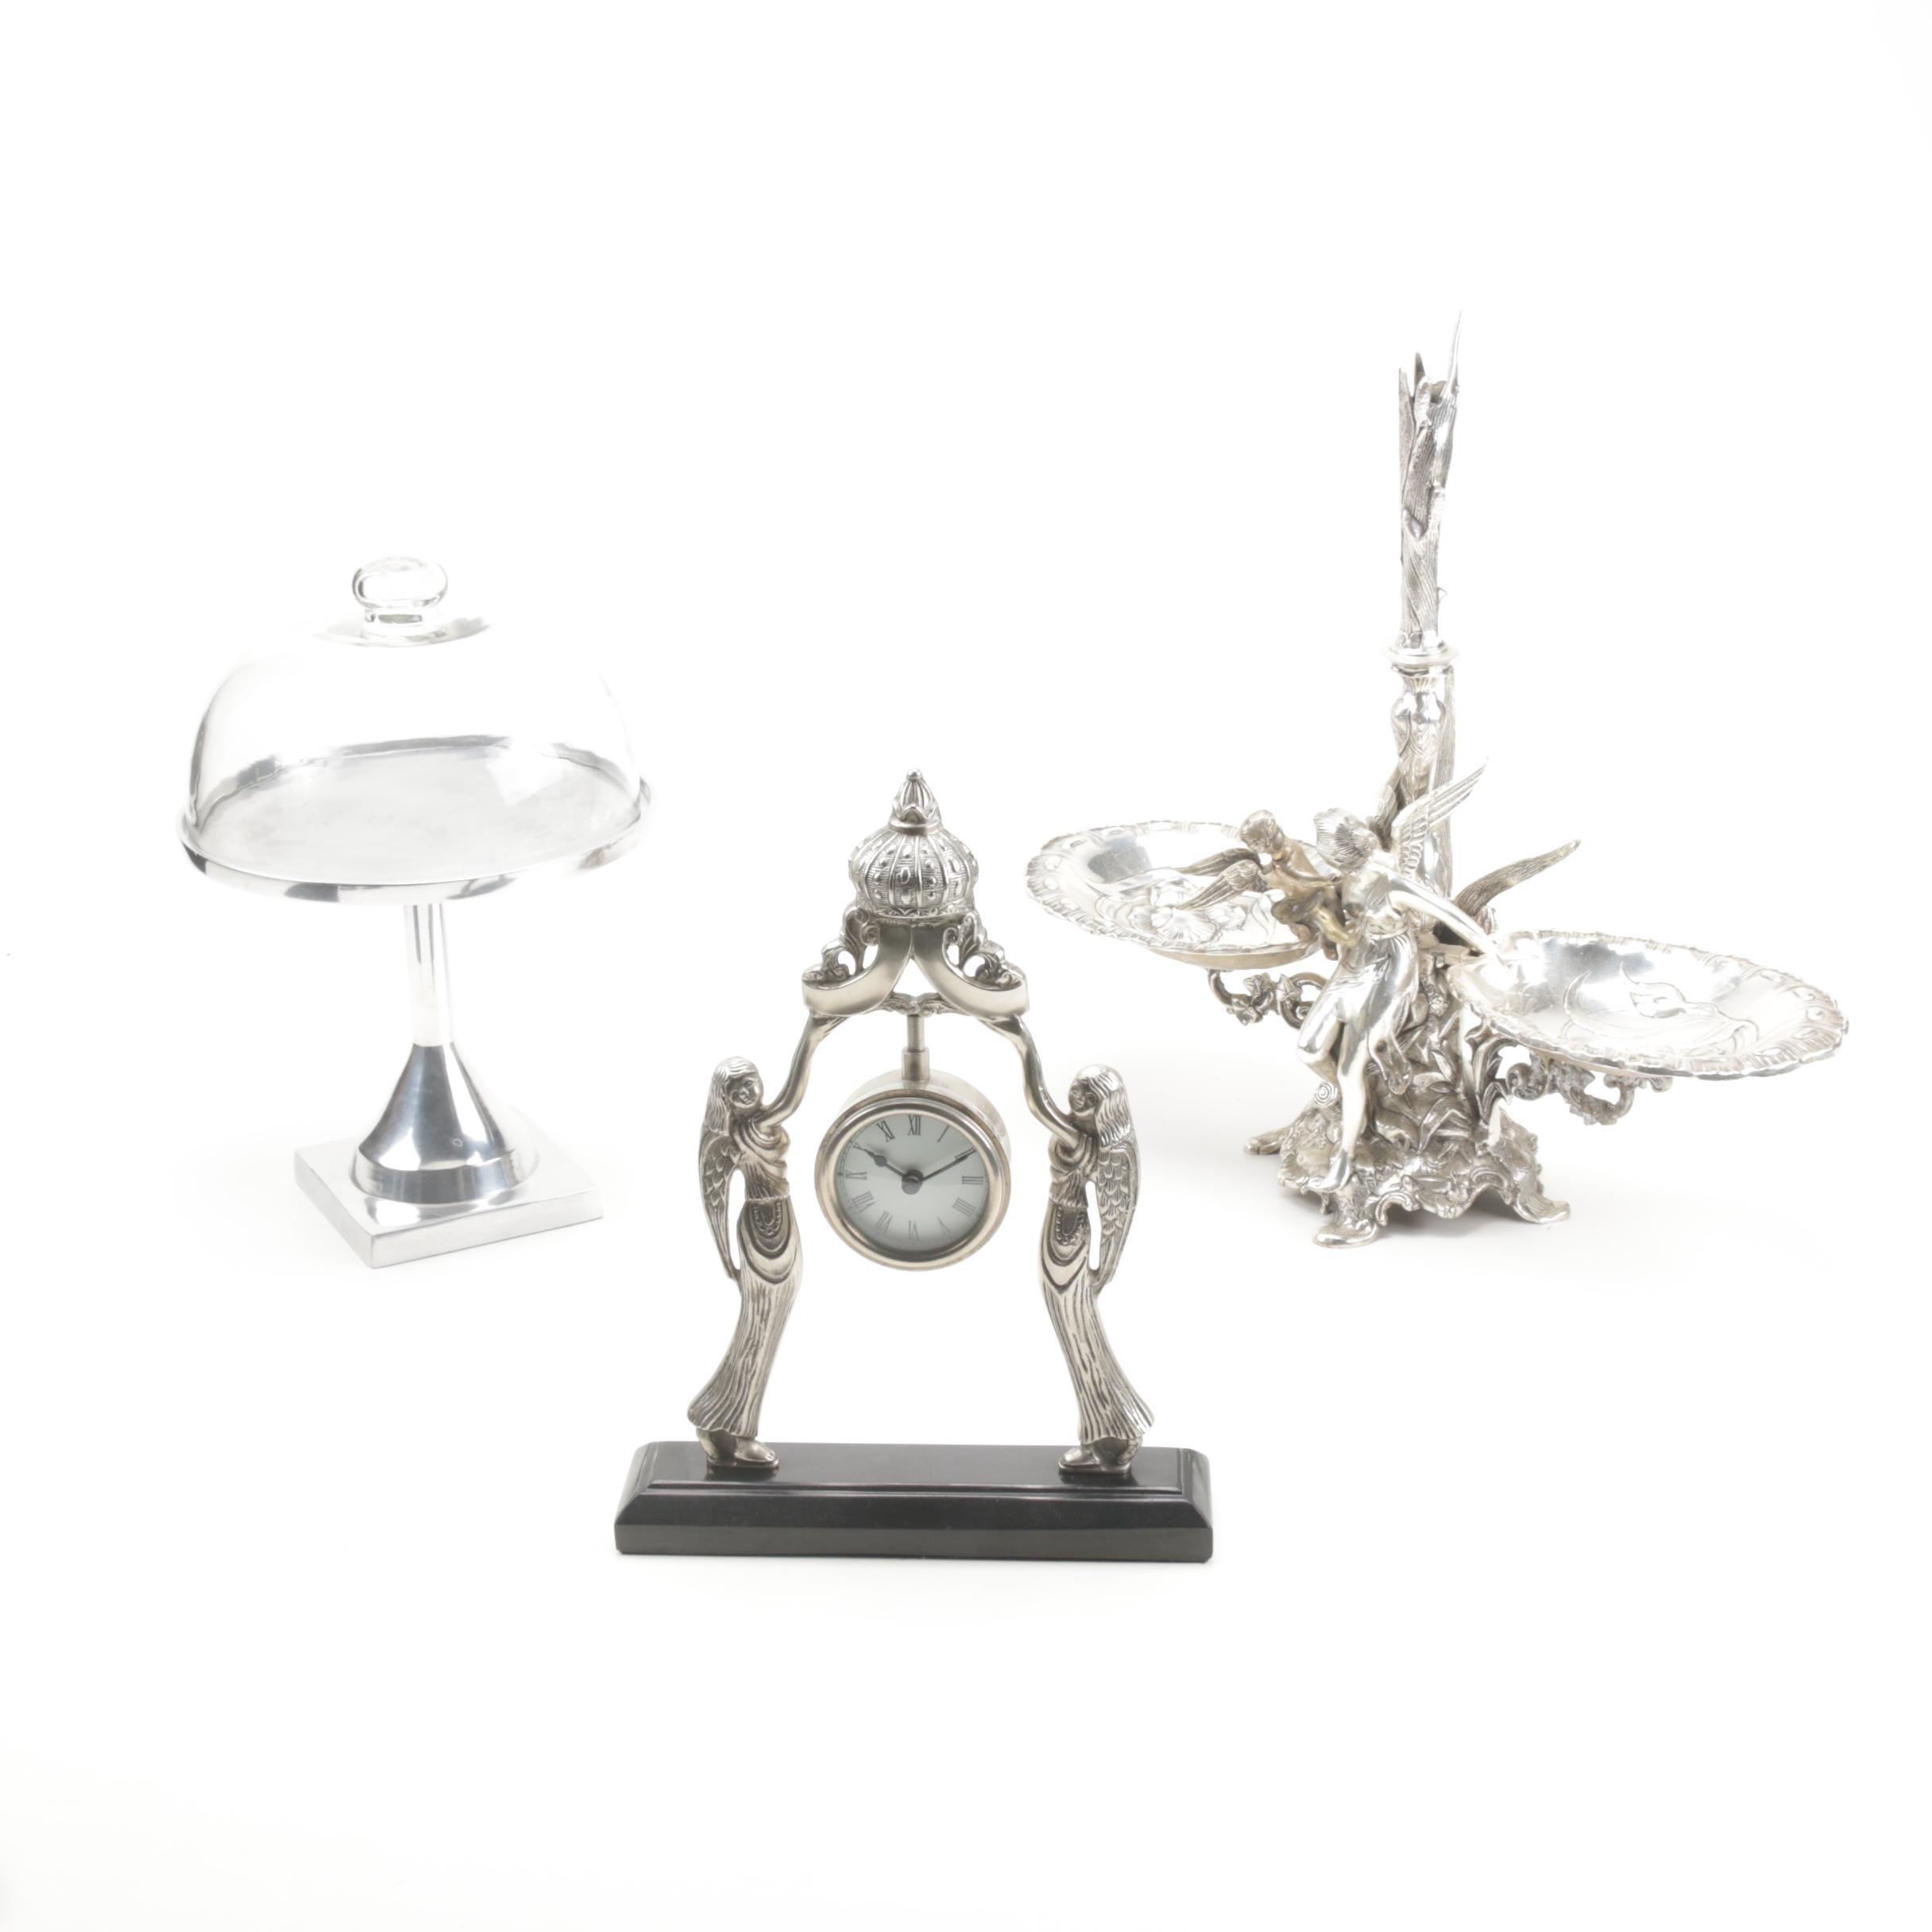 Cast Metal Serveware and Decor